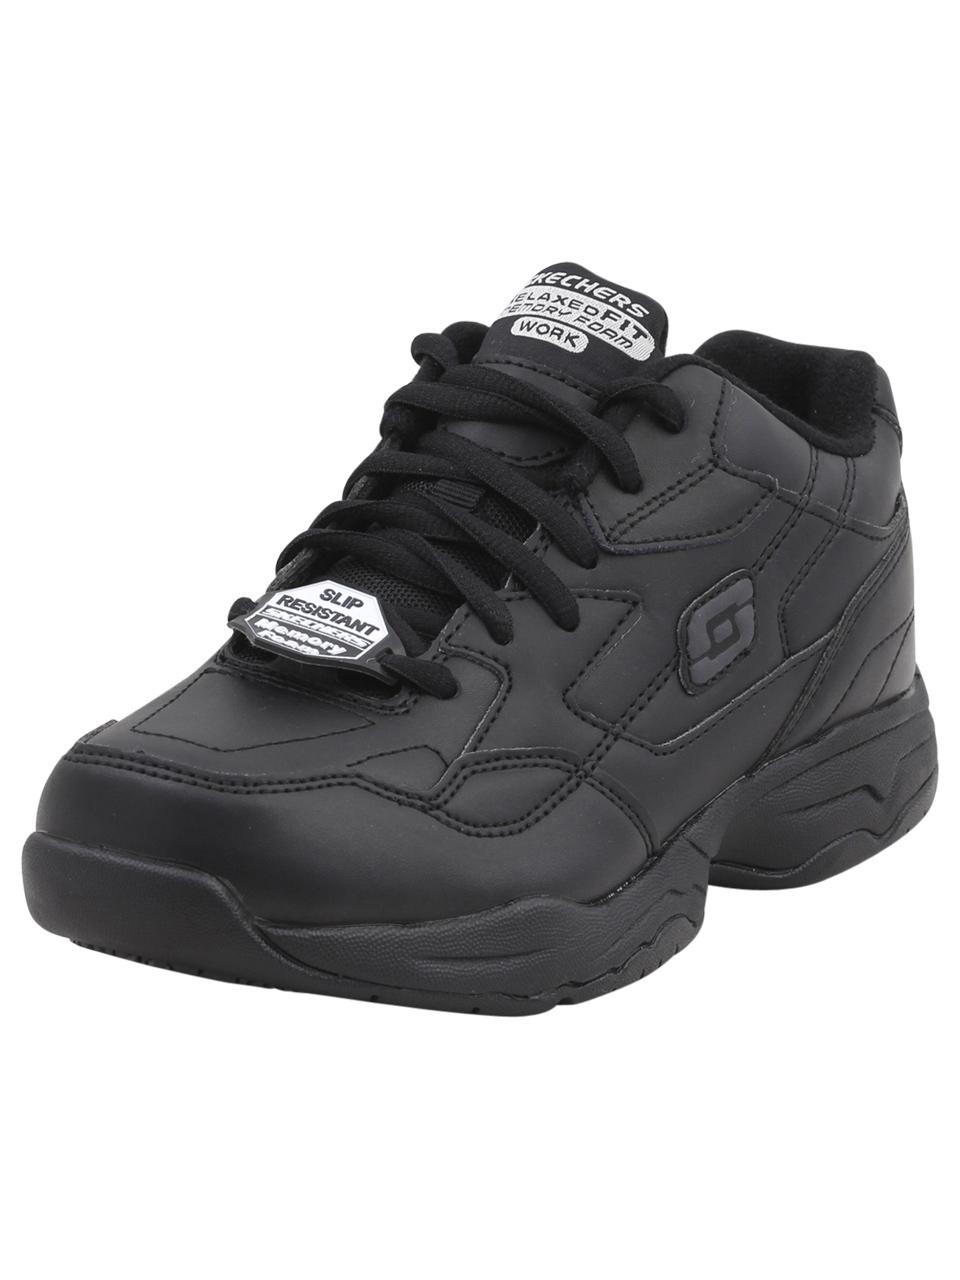 10884c325343 Skechers Relaxed Fit Felton Albie Black Slip Resistant Sneakers ...